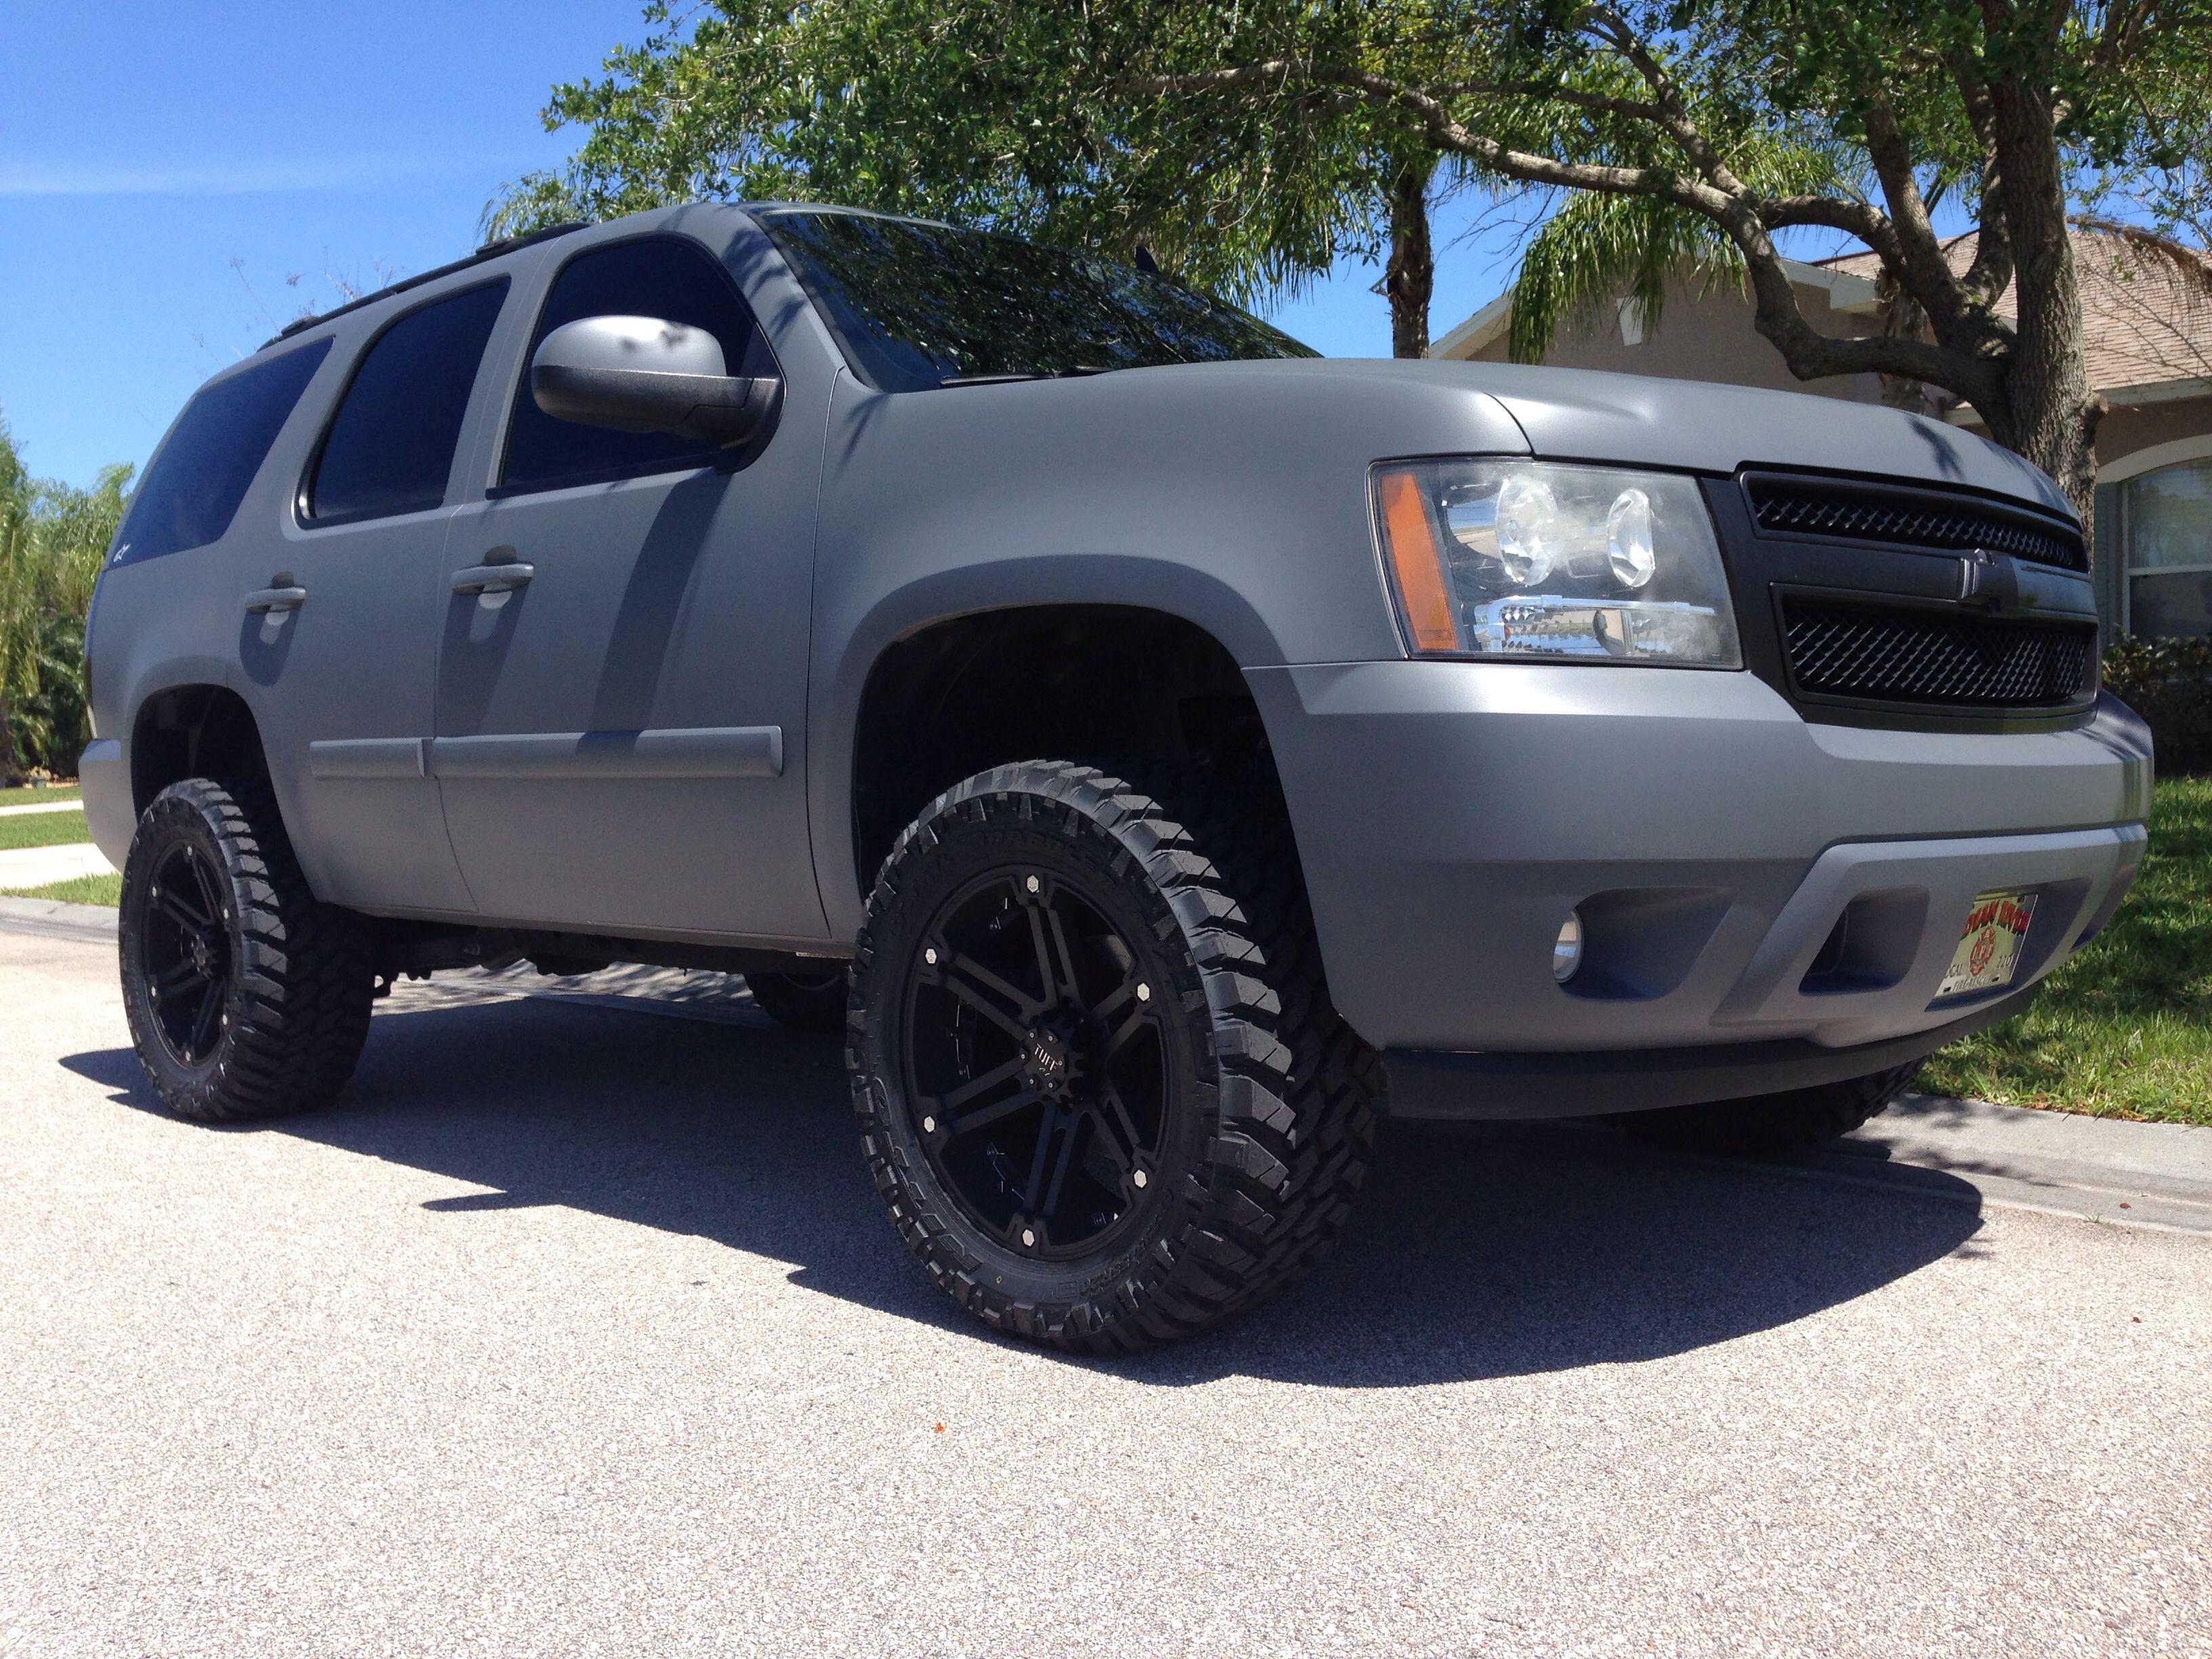 motors panther tahoe revo inc city ltz chevrolet pharr texas vehicle in